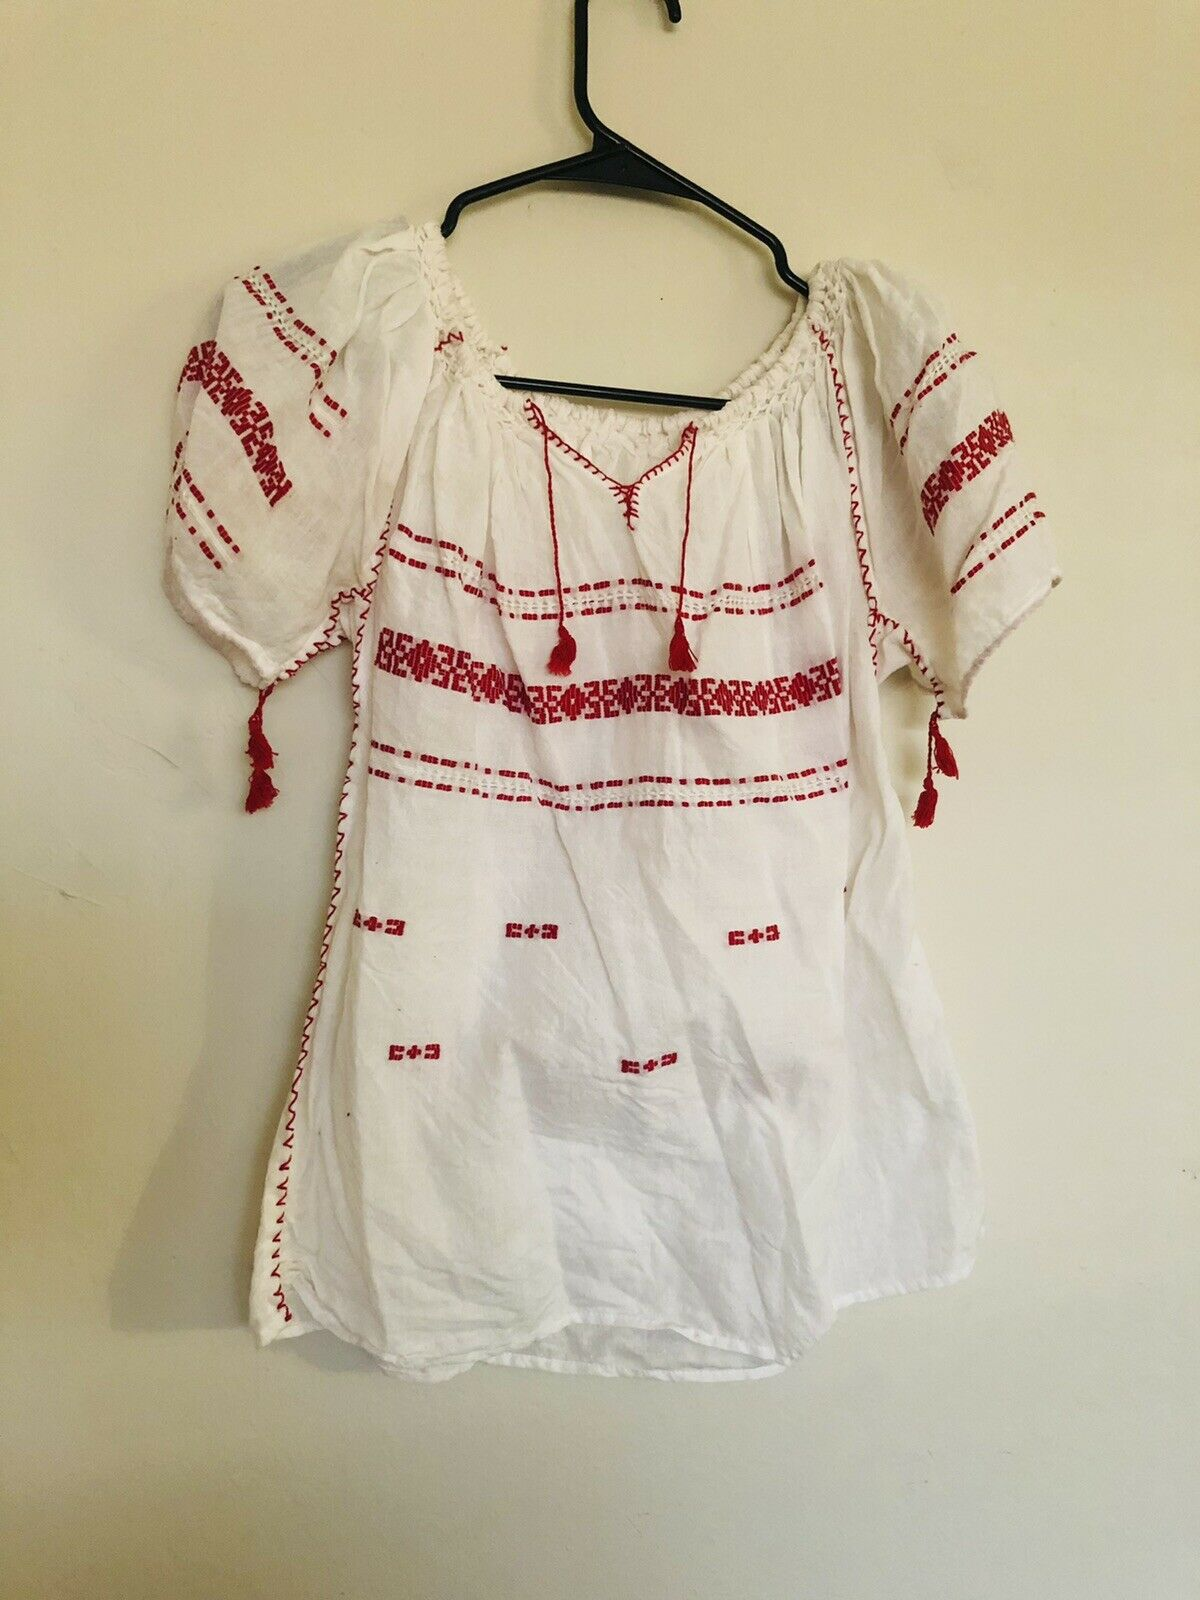 Vintage 1960/70 Hungarian Blouse, Fits size xs/sm… - image 1